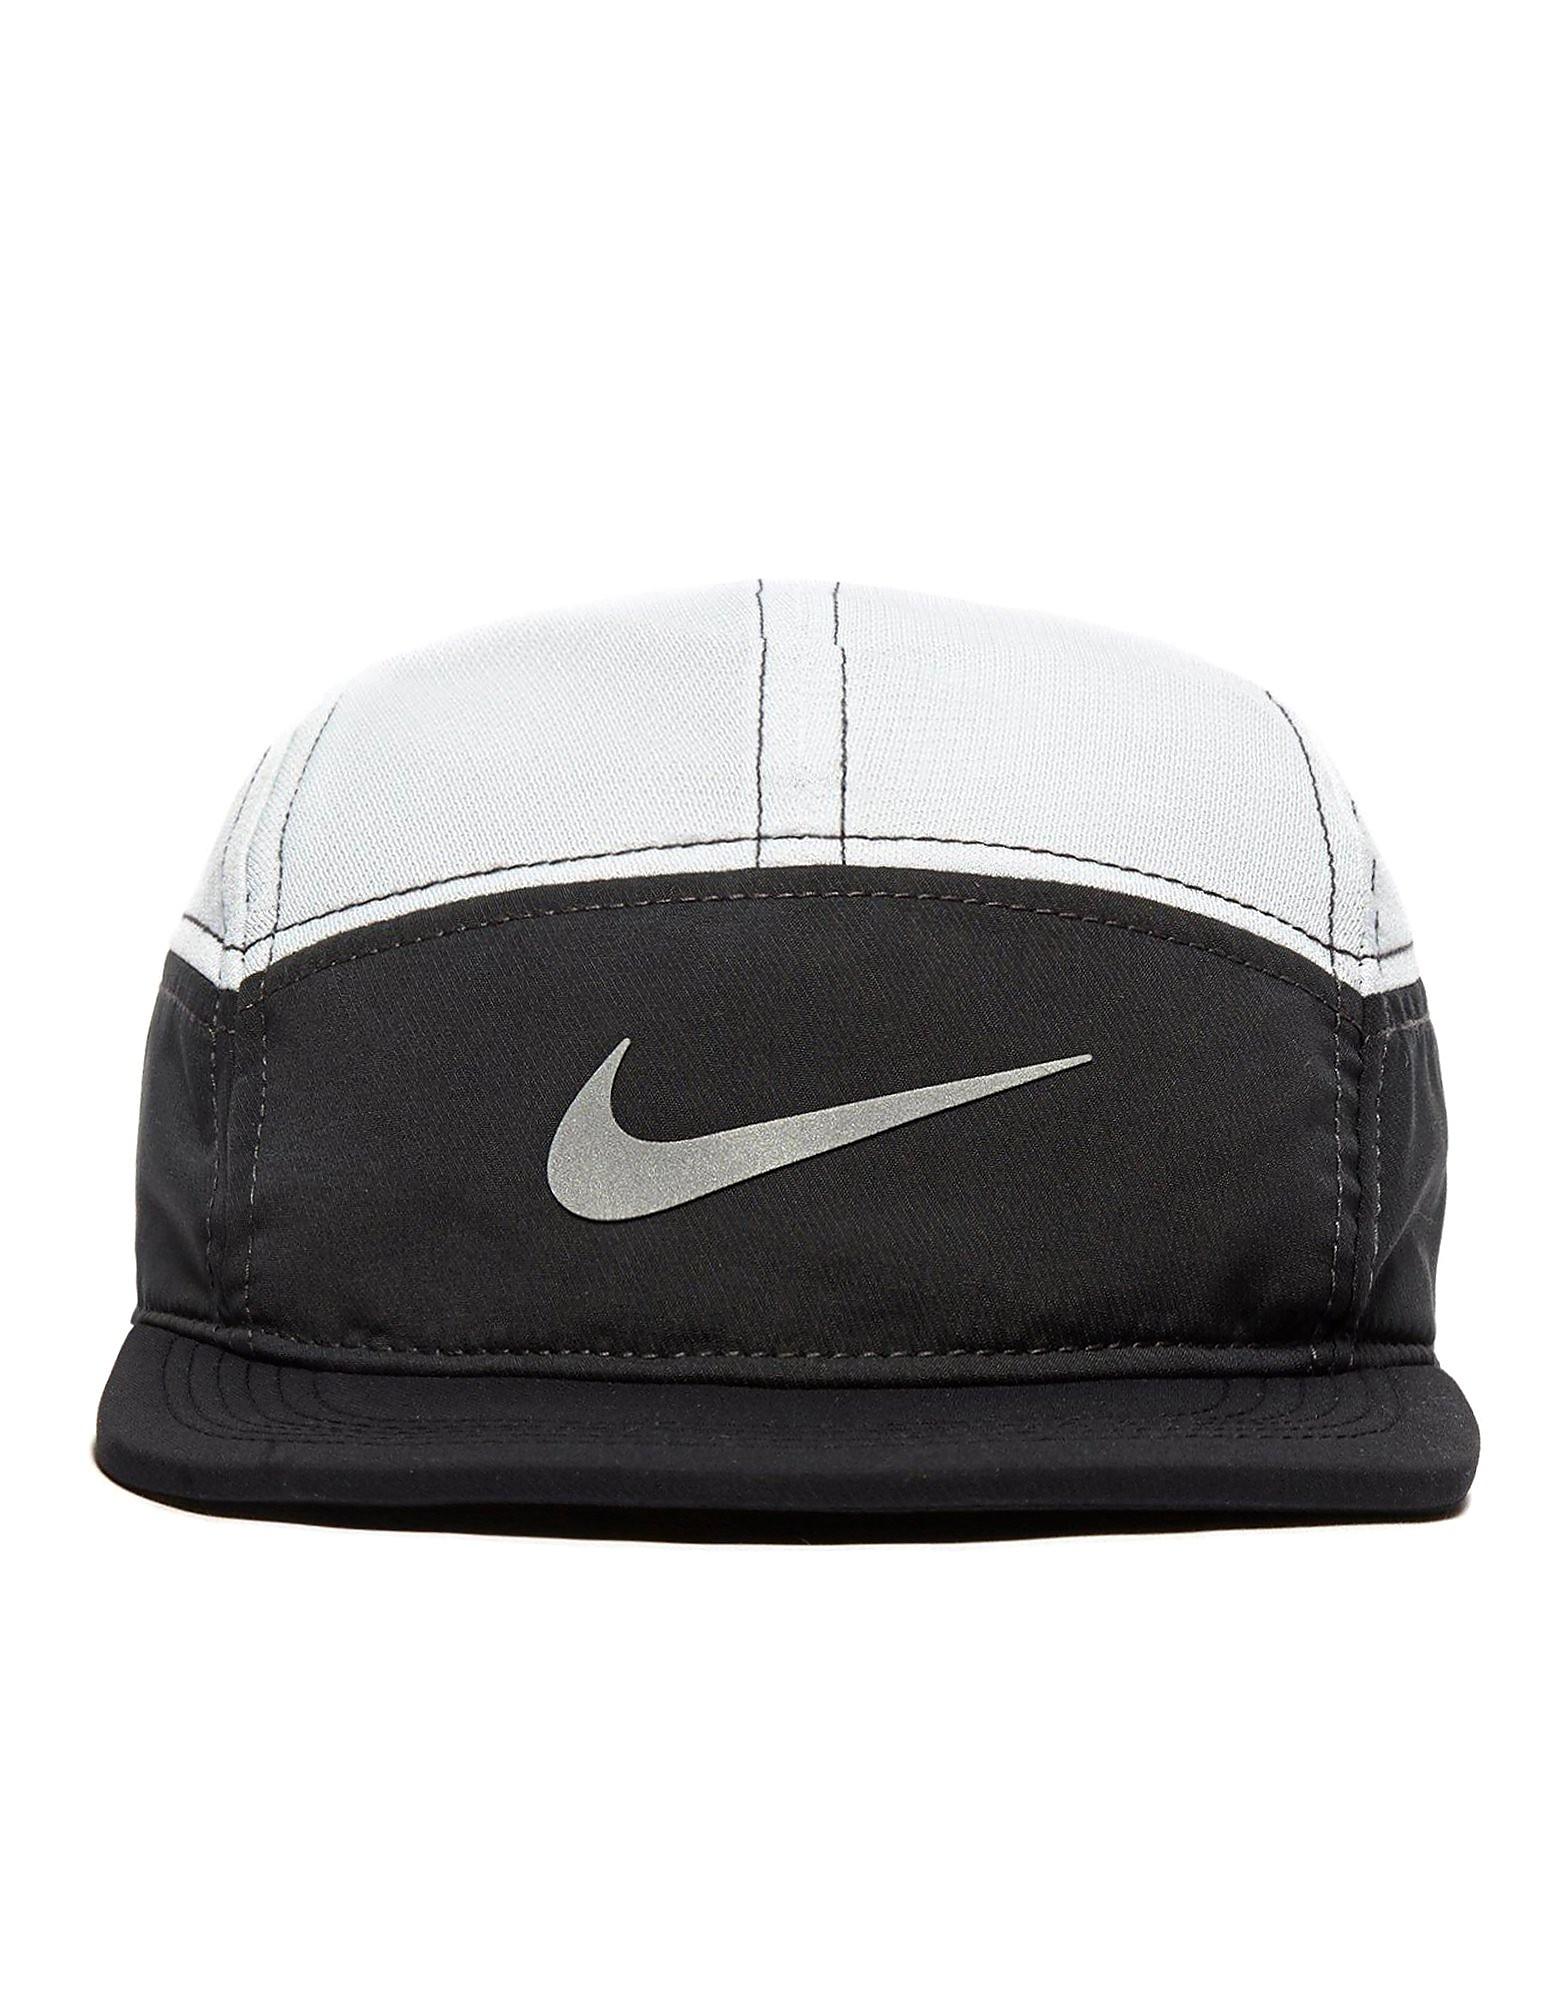 cc7d9014aef ... inexpensive nike run zip aw84 cap black white mens sports king store  74c10 7b572